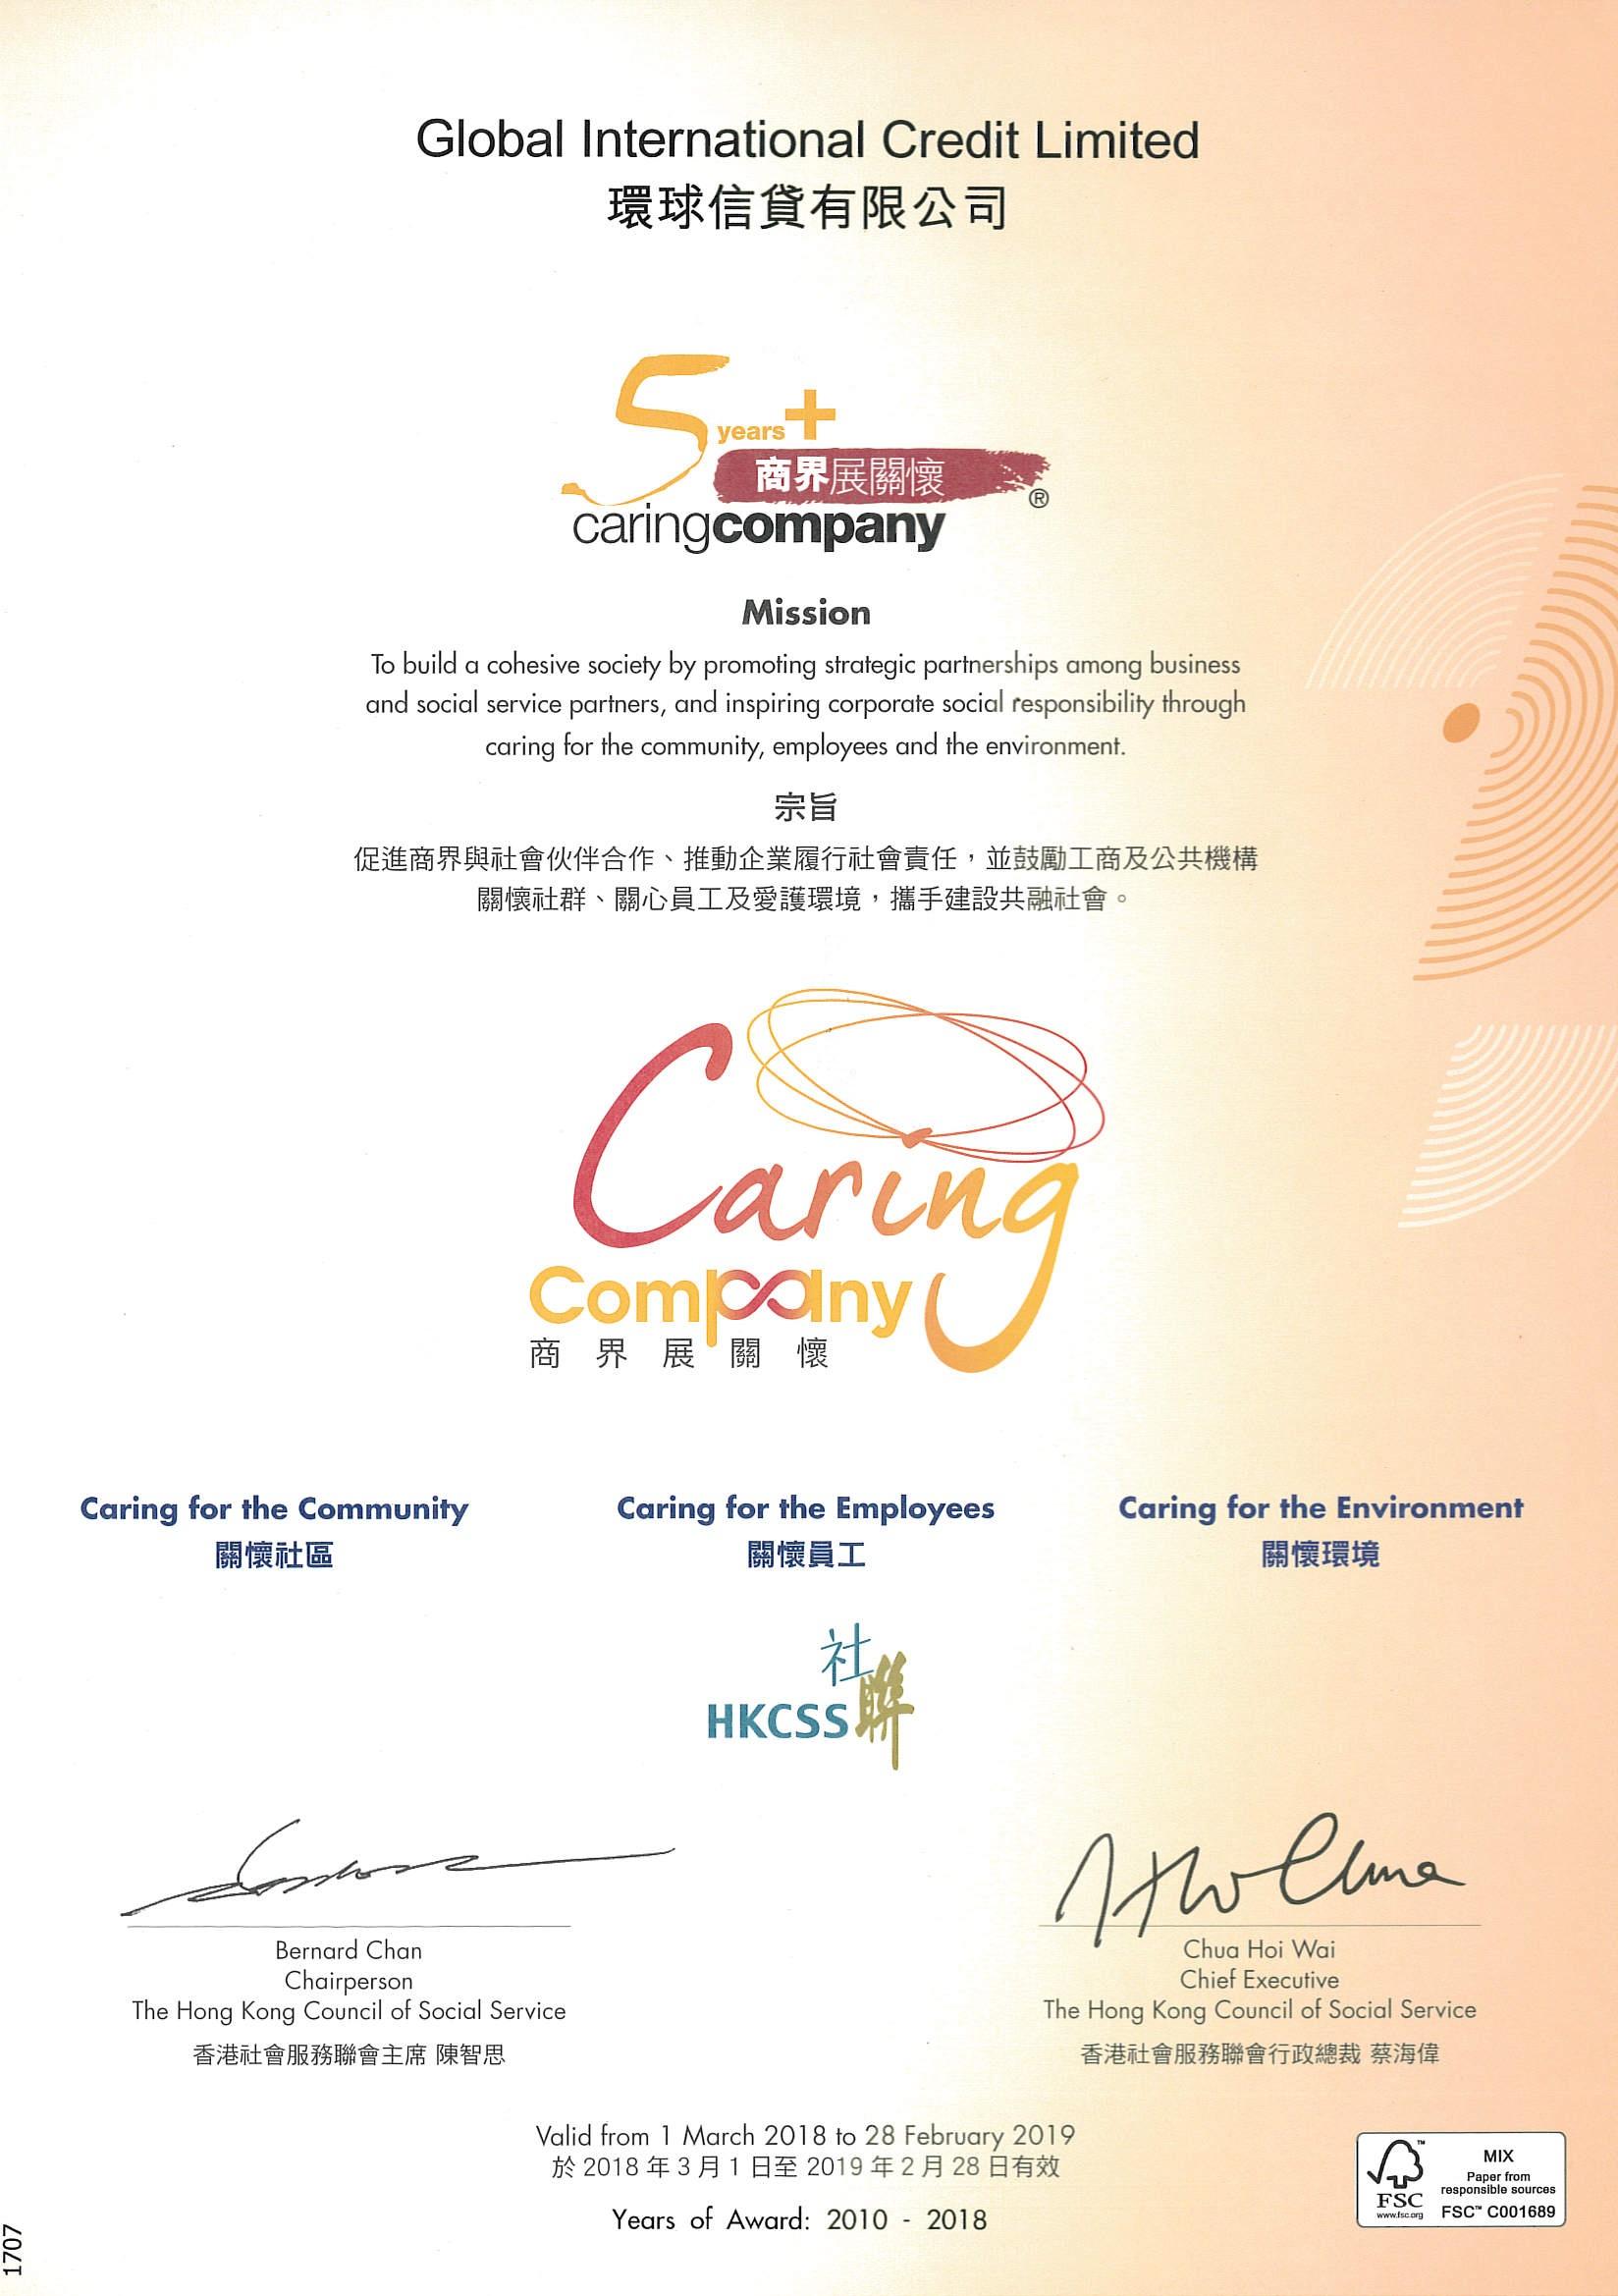 GICL – Caring Company 2018